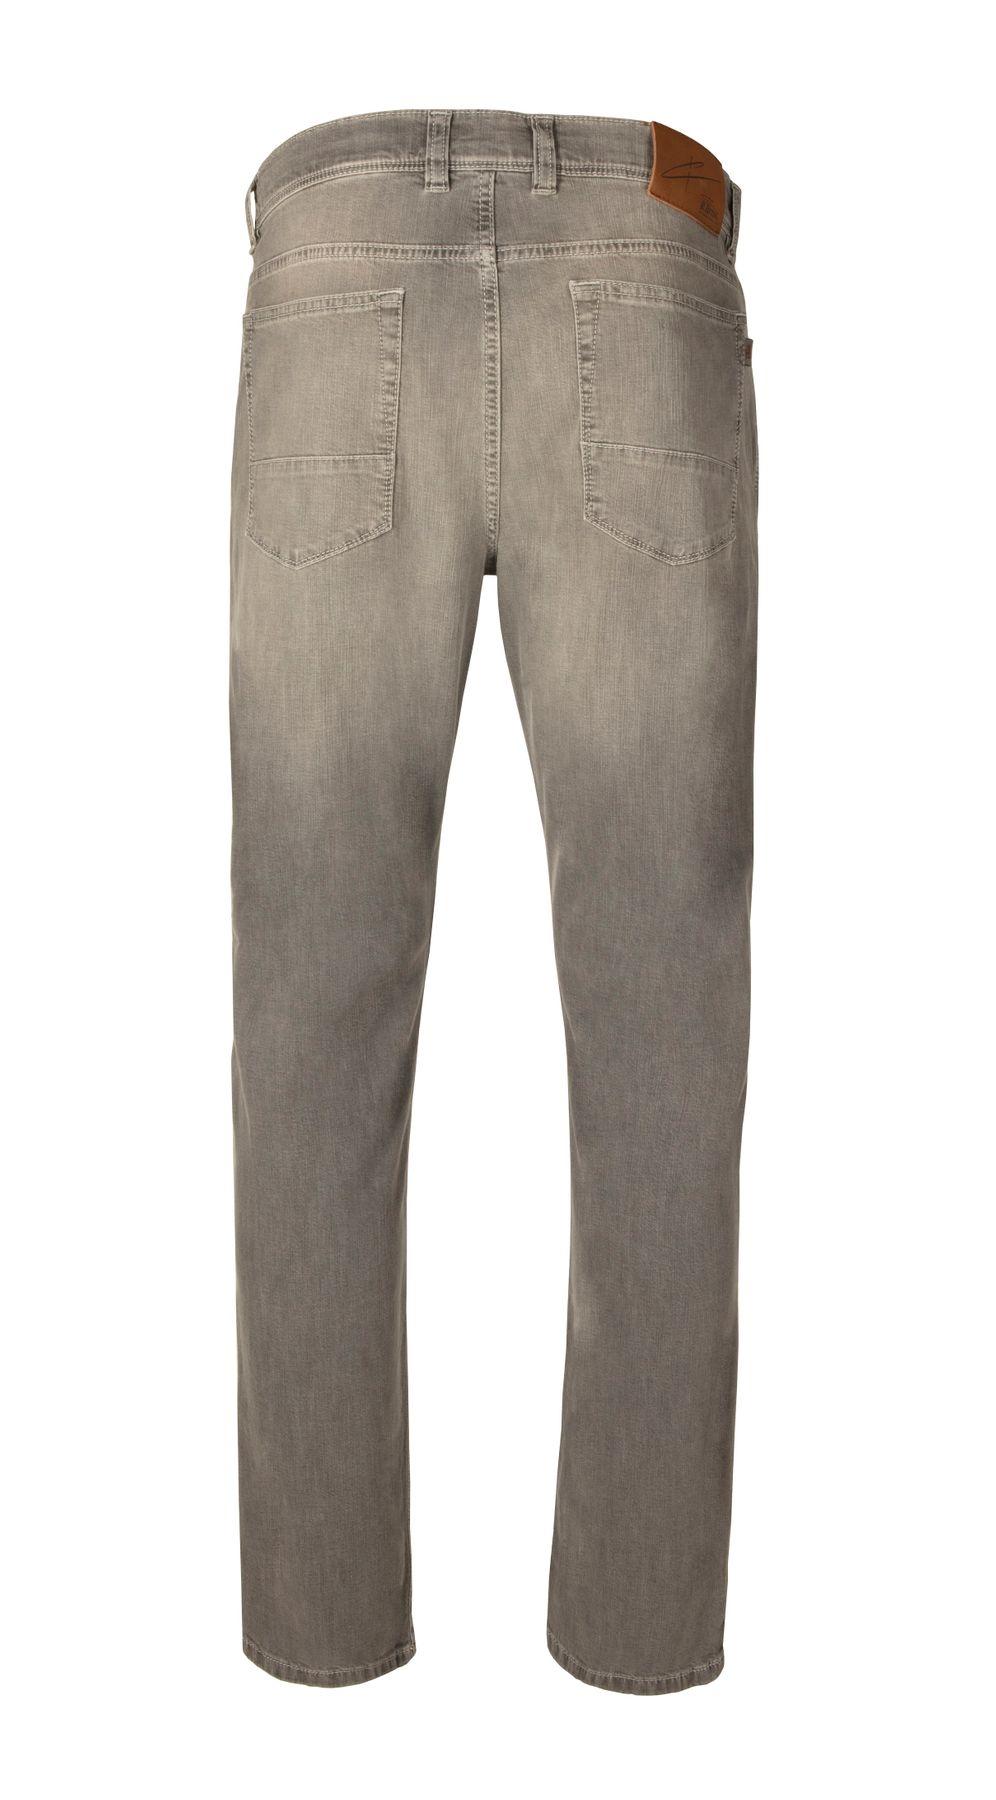 Brühl - Herren 5-Pocket Jeans in verschiedenen Farben, Maro Do (0665003163100) – Bild 2